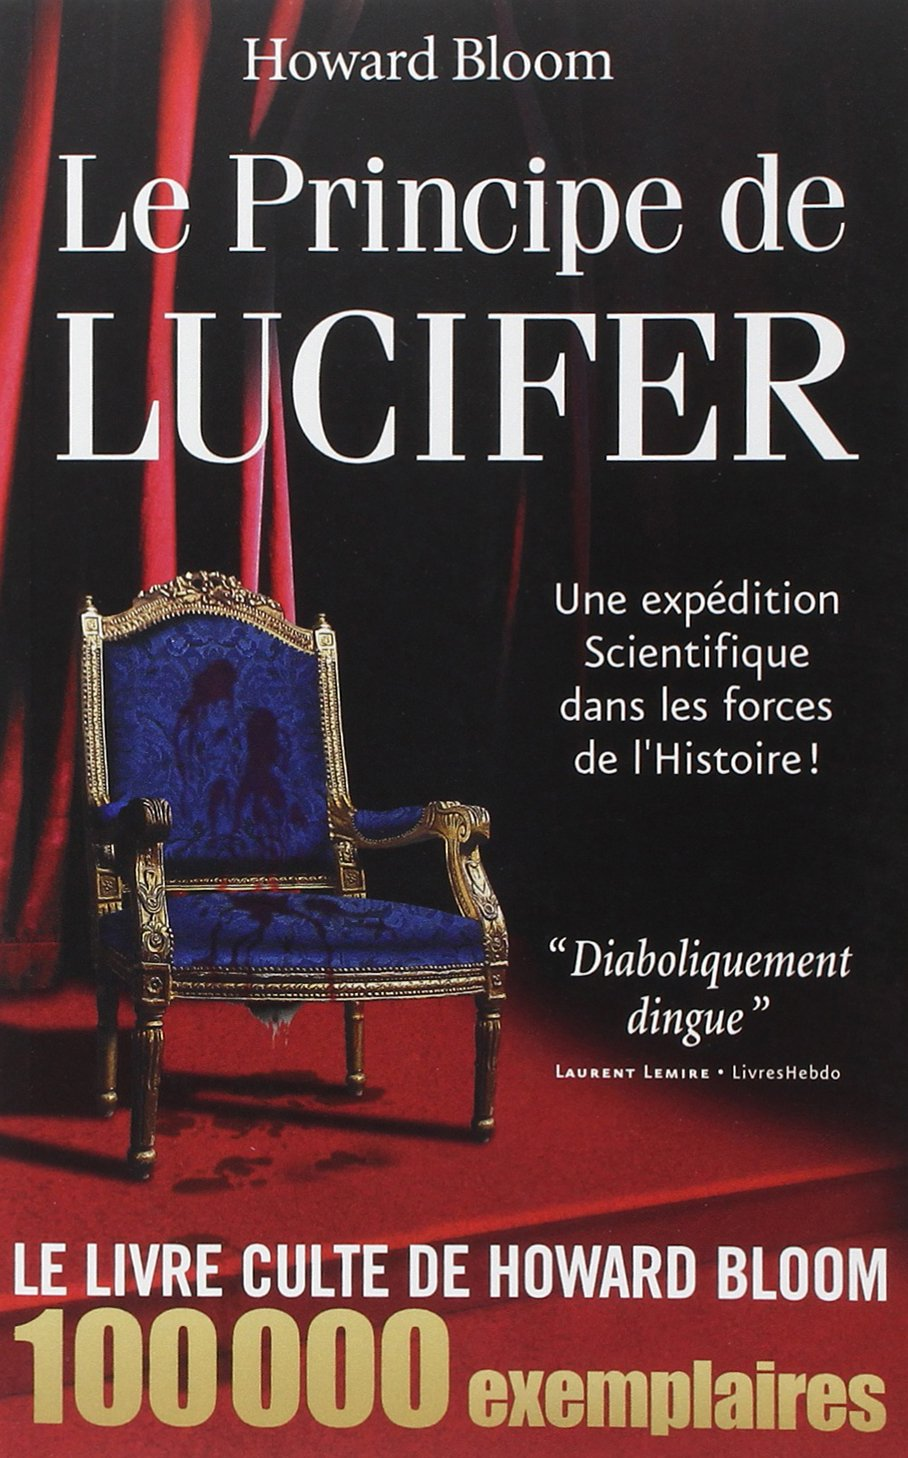 Howard Bloom - Le Principe de Lucifer (Epub)